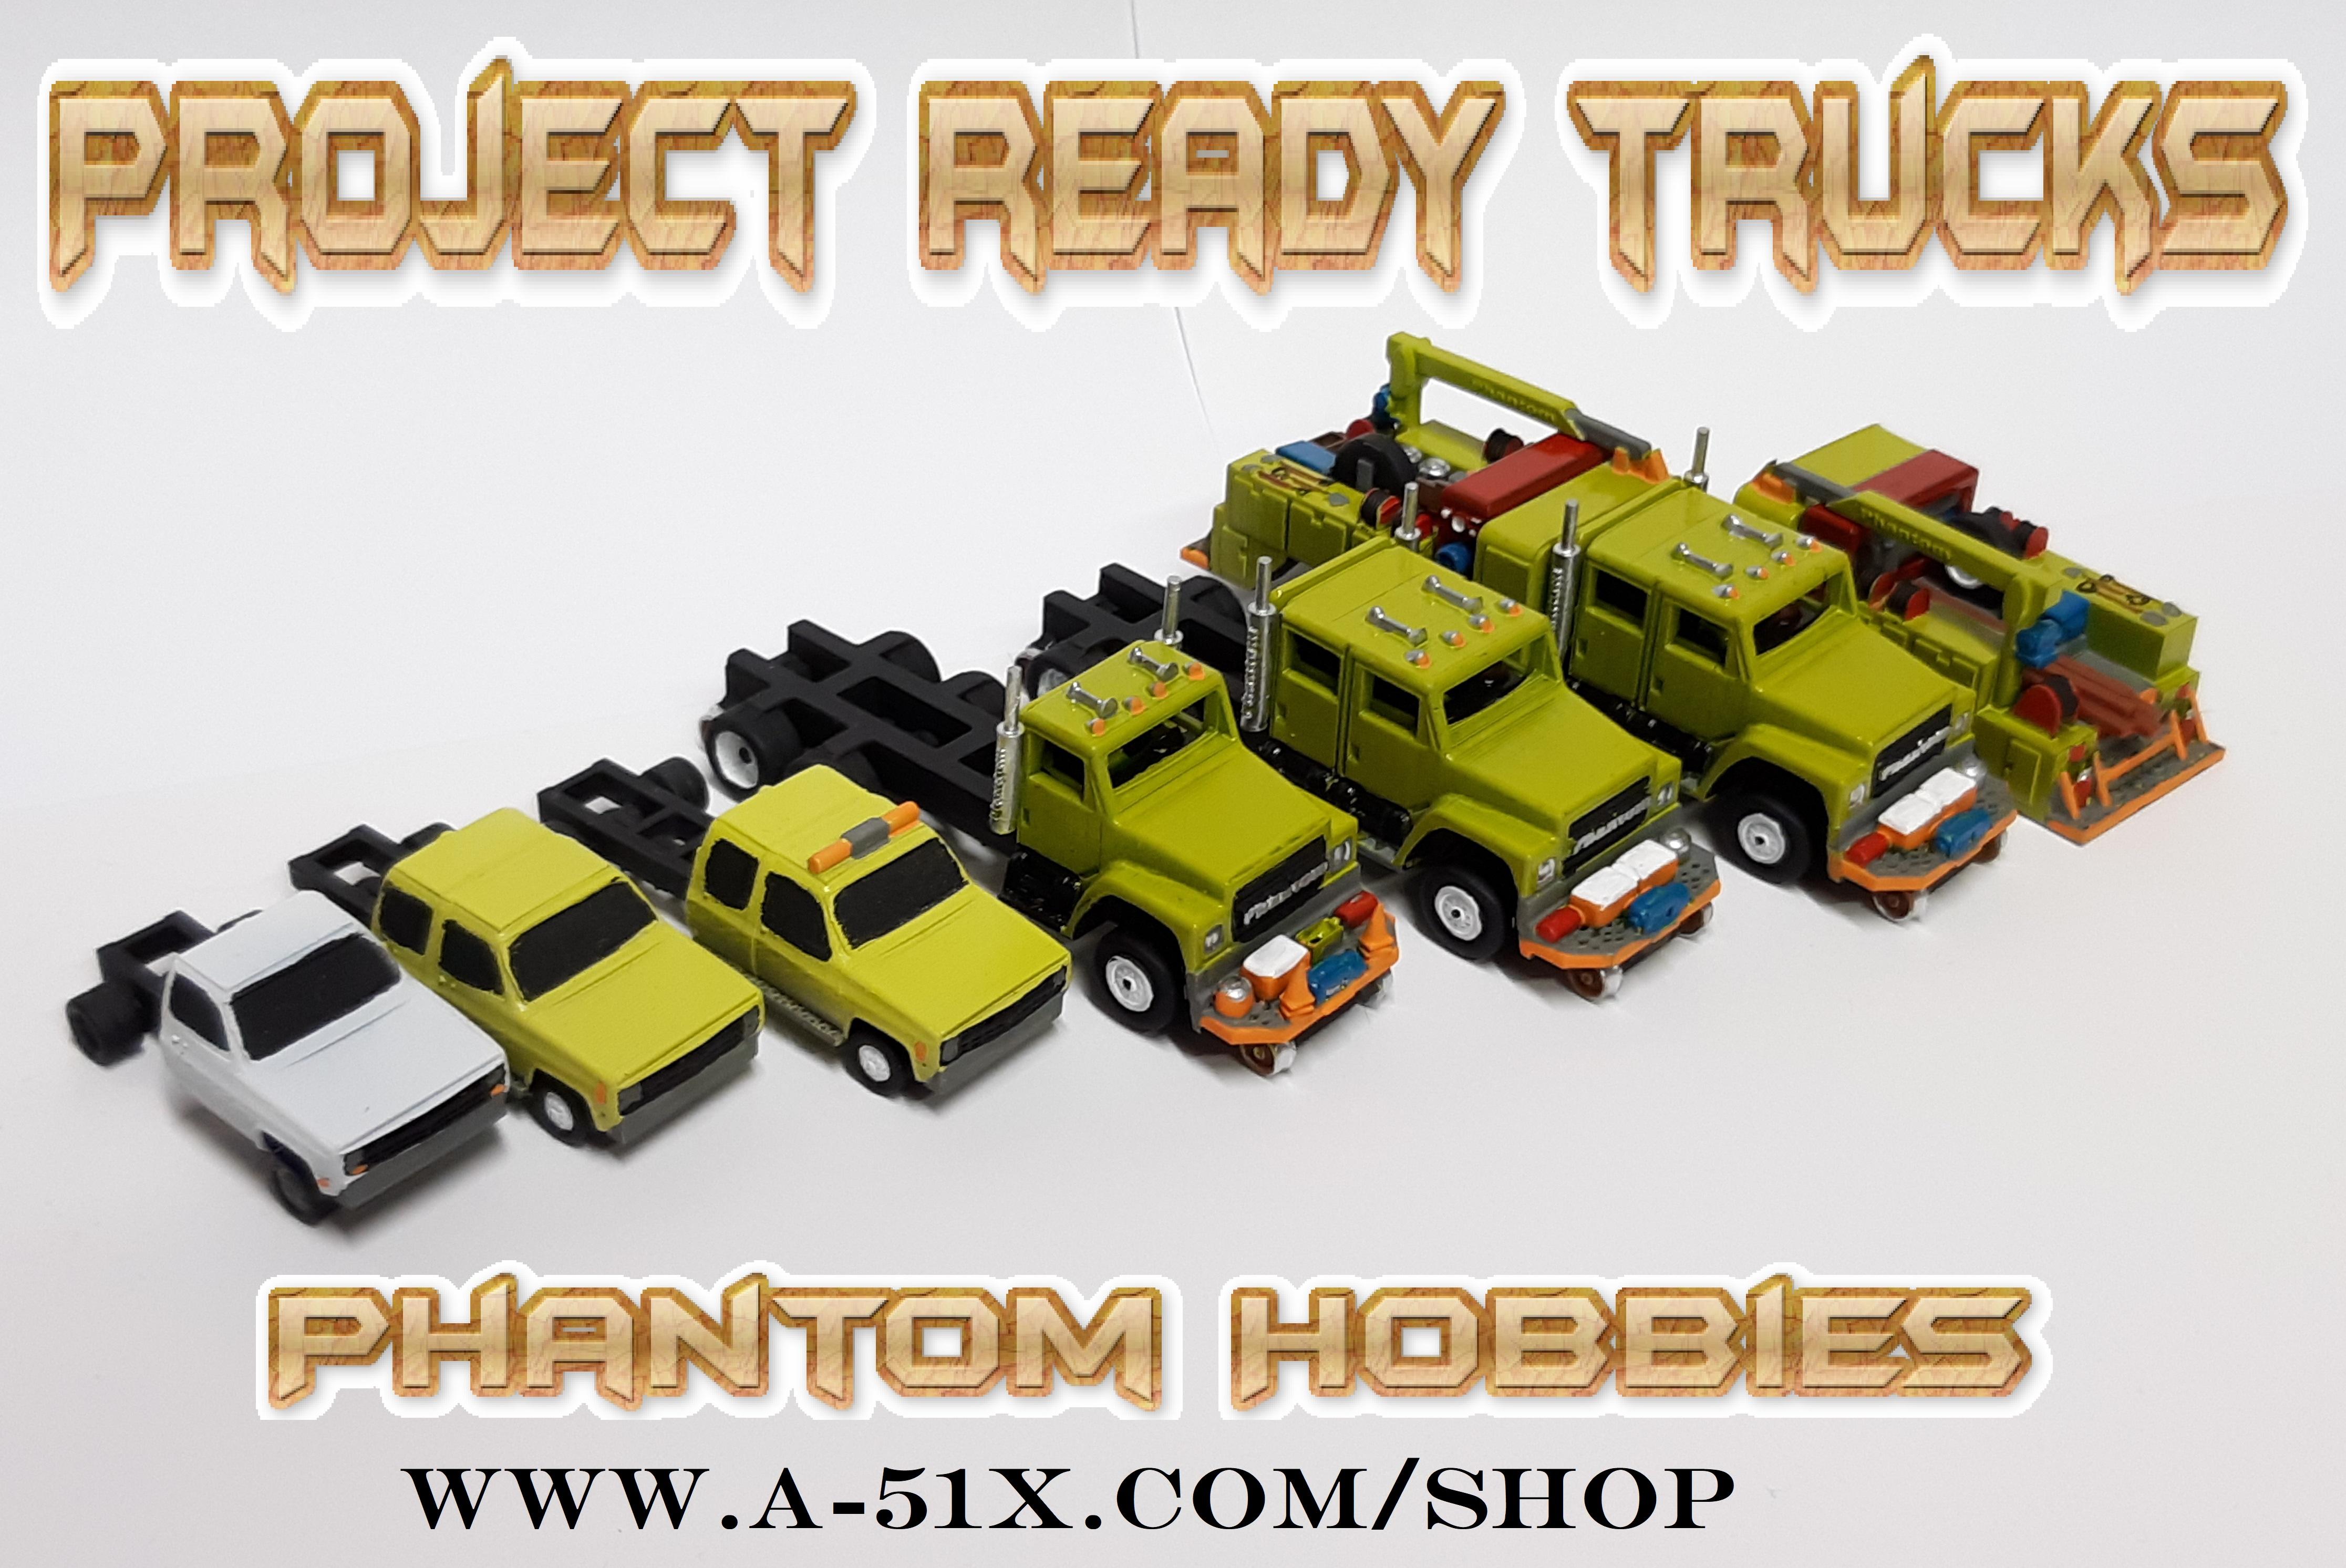 Project ready trucks